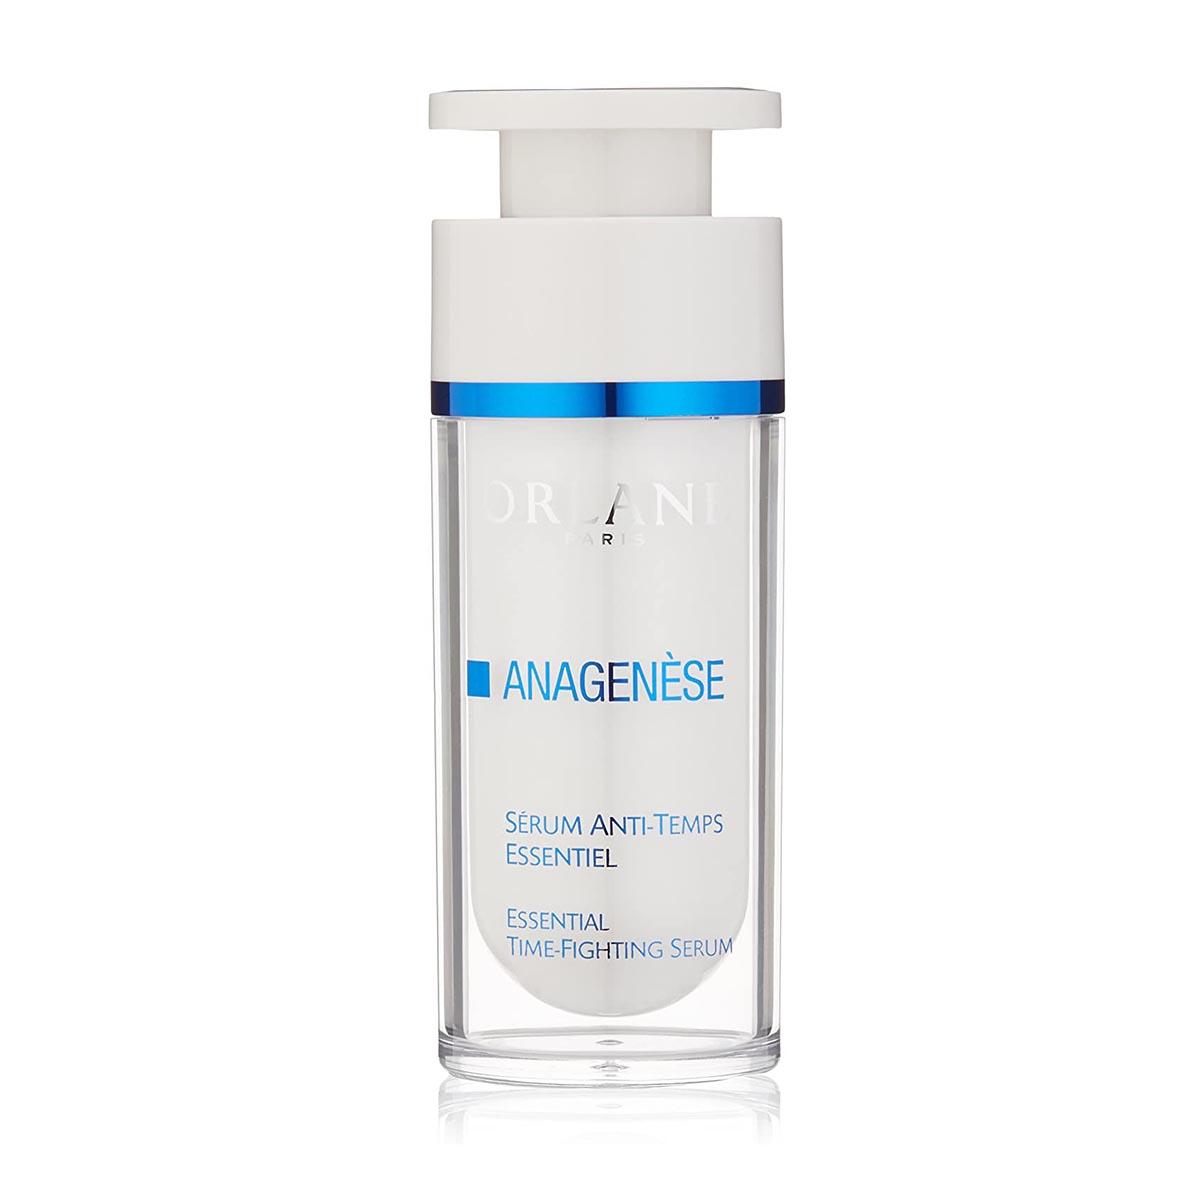 Orlane anagenese essential serum 30ml